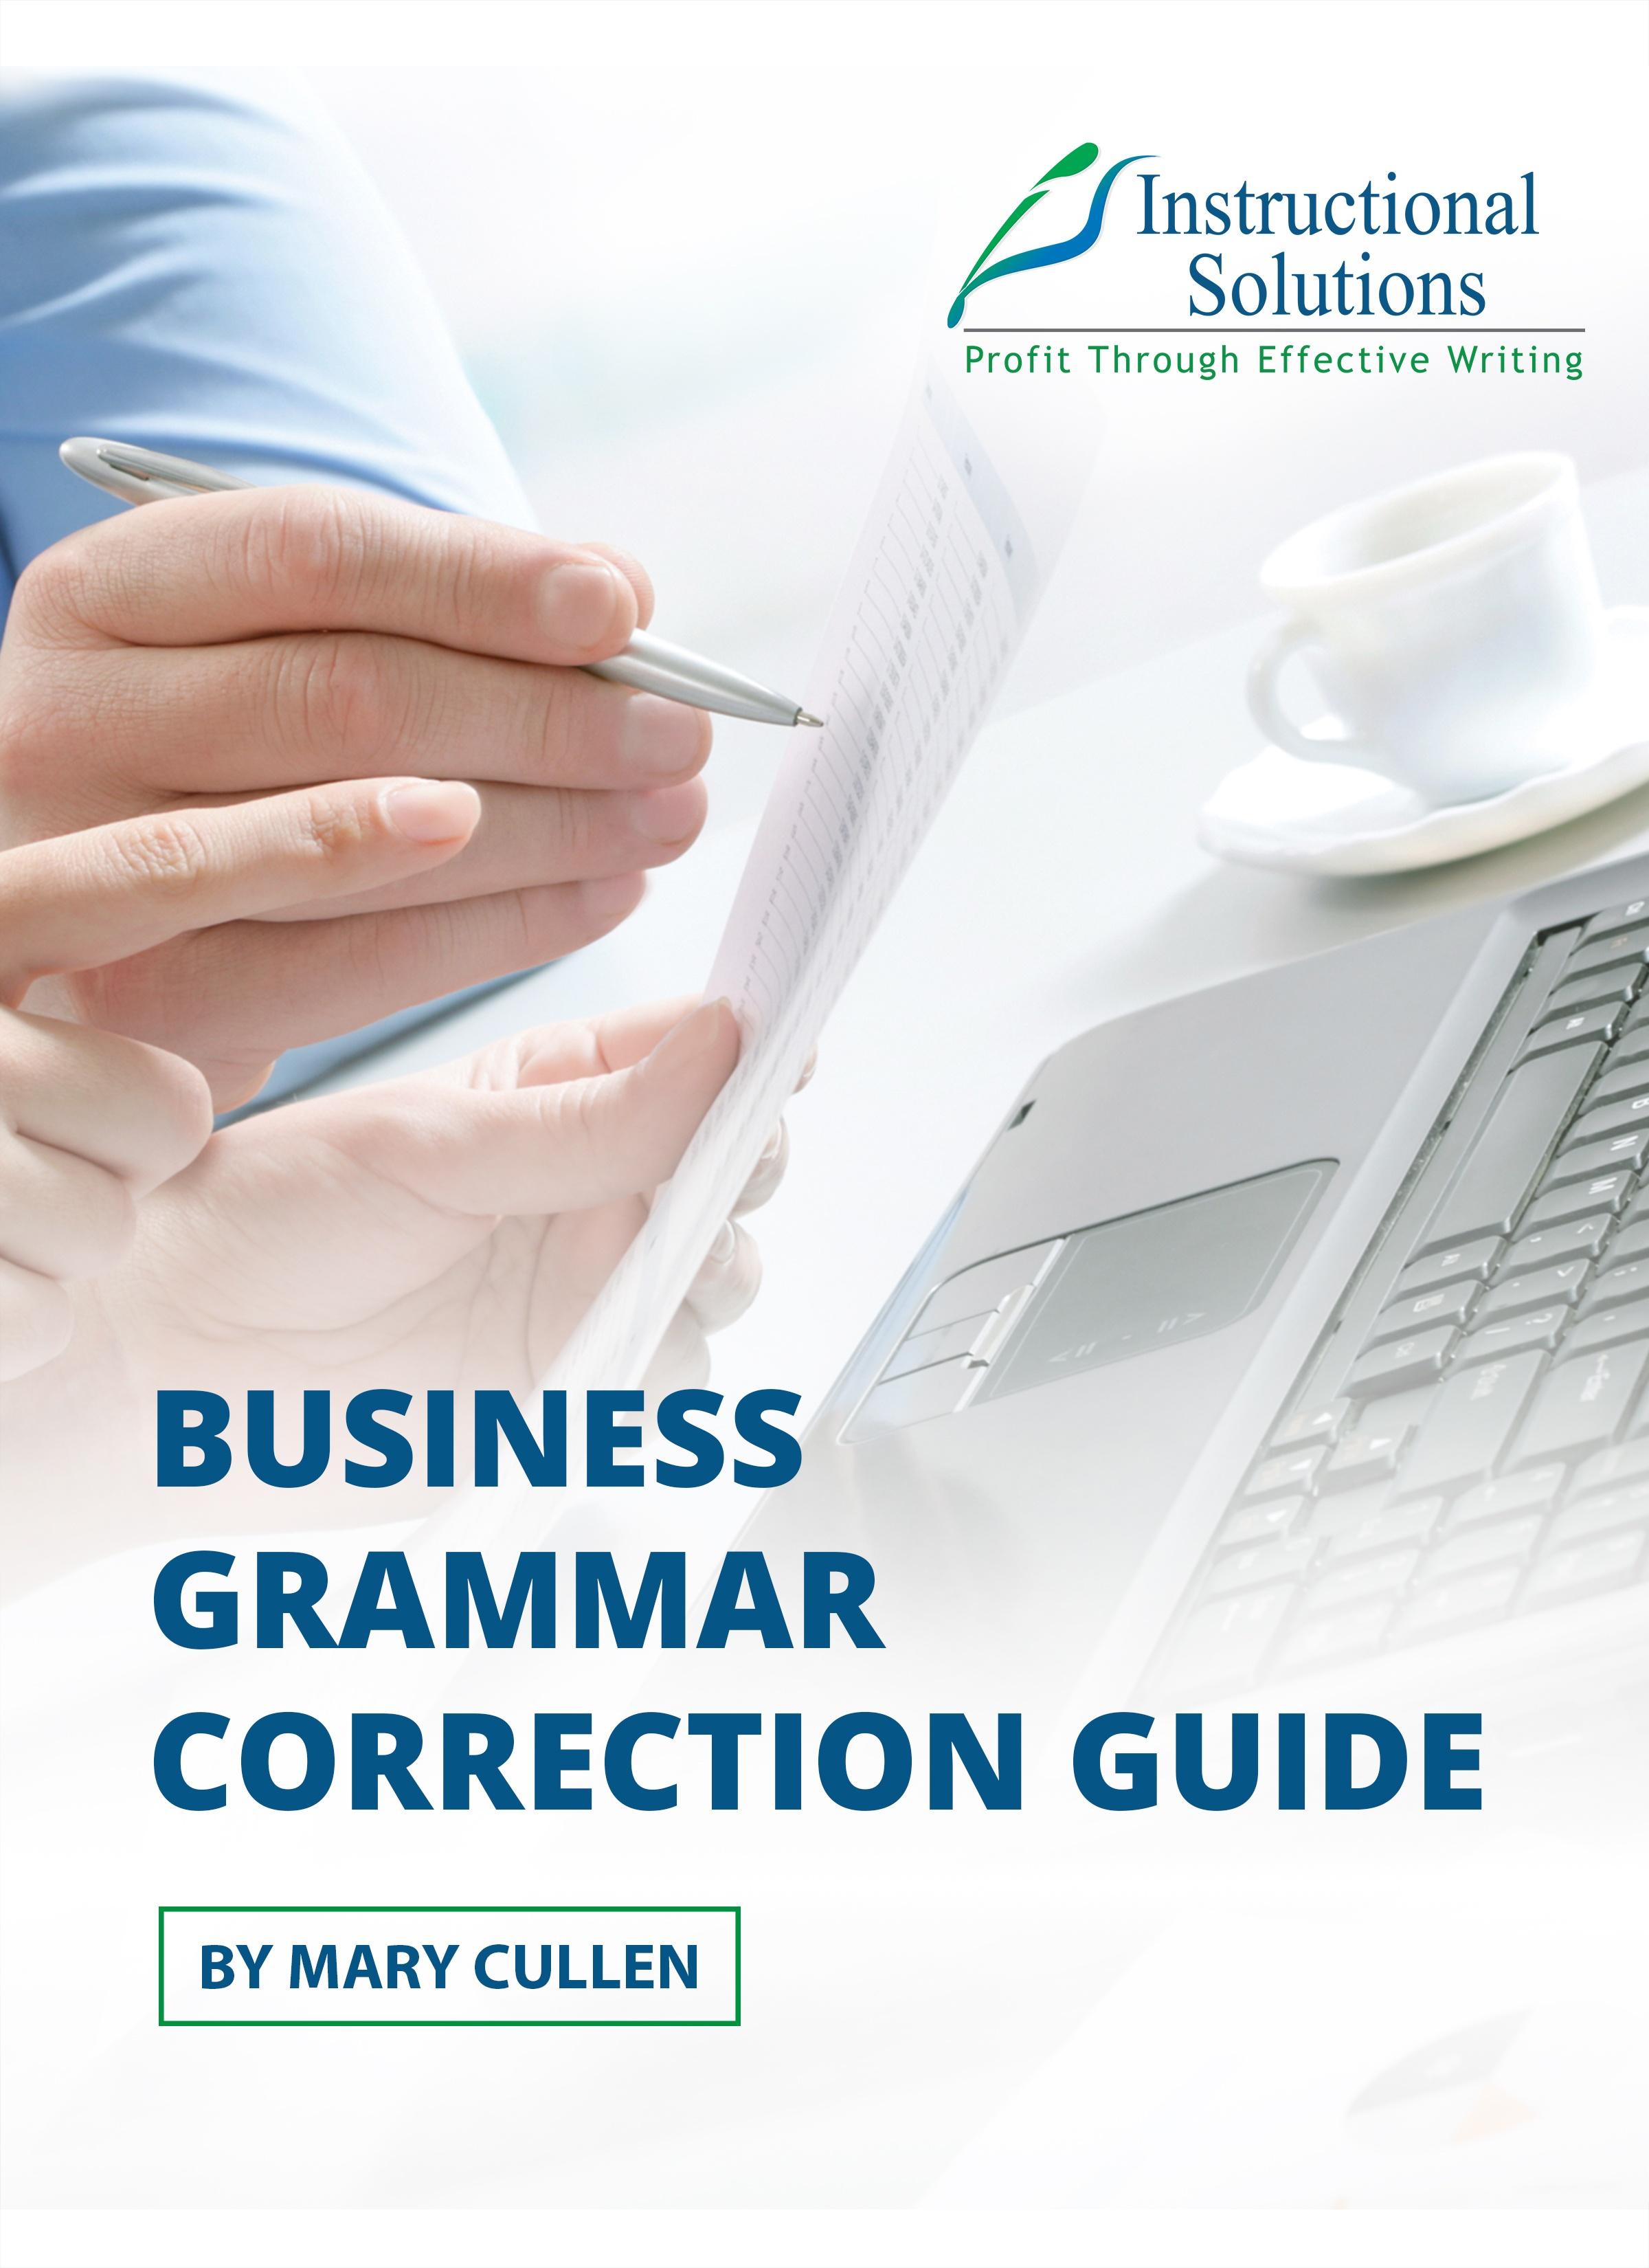 business-grammar-correction-guide